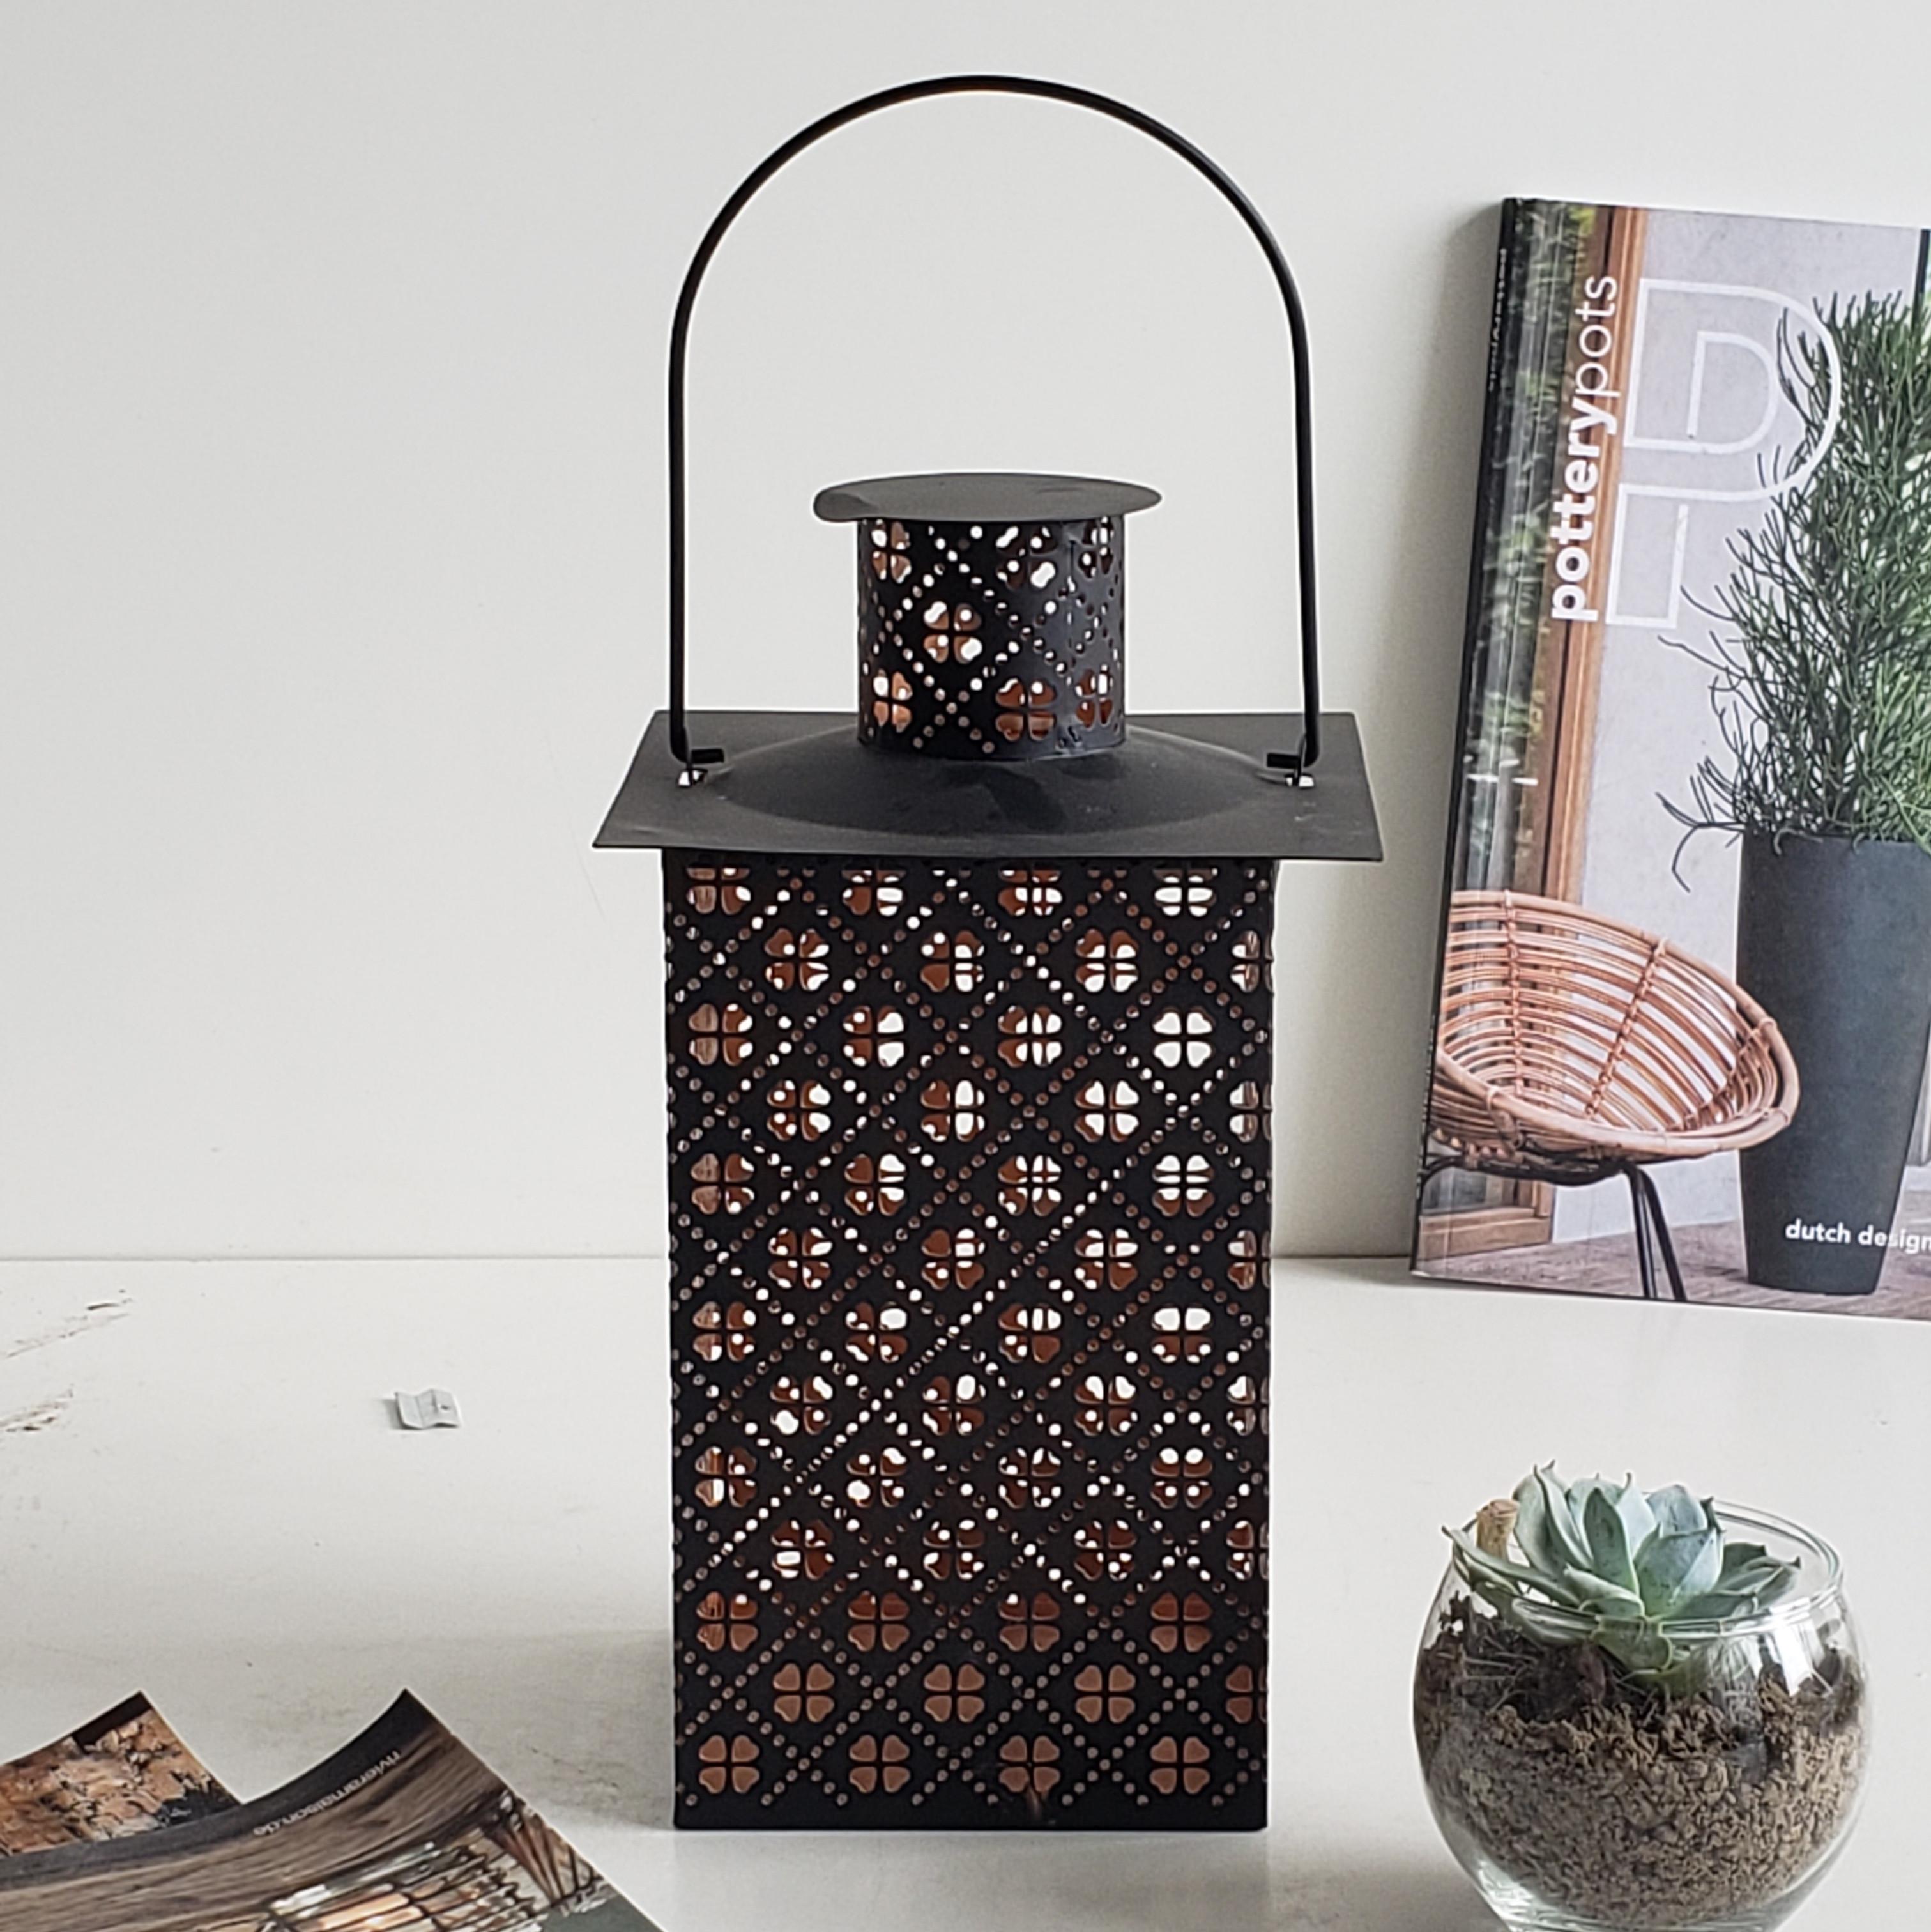 Vintage Lentera Grosir Solar Metal Badai Lentera Vintage Mini Teh Lilin Lampu Hias Led Dekoratif Lentera